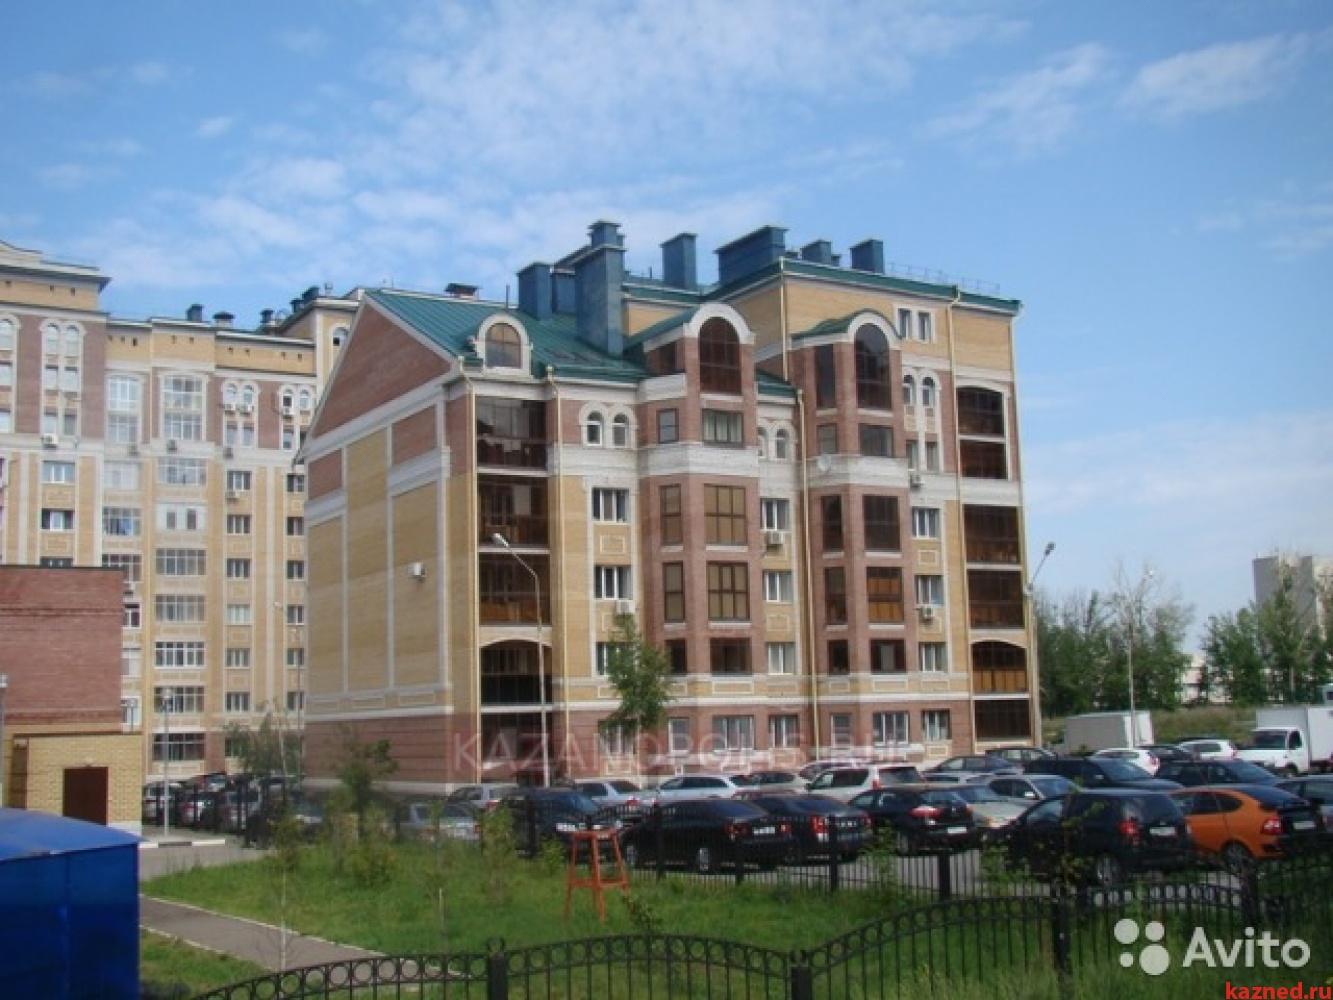 Продажа 3-к квартиры Мидхата Булатова, д.5, 123 м2  (миниатюра №3)